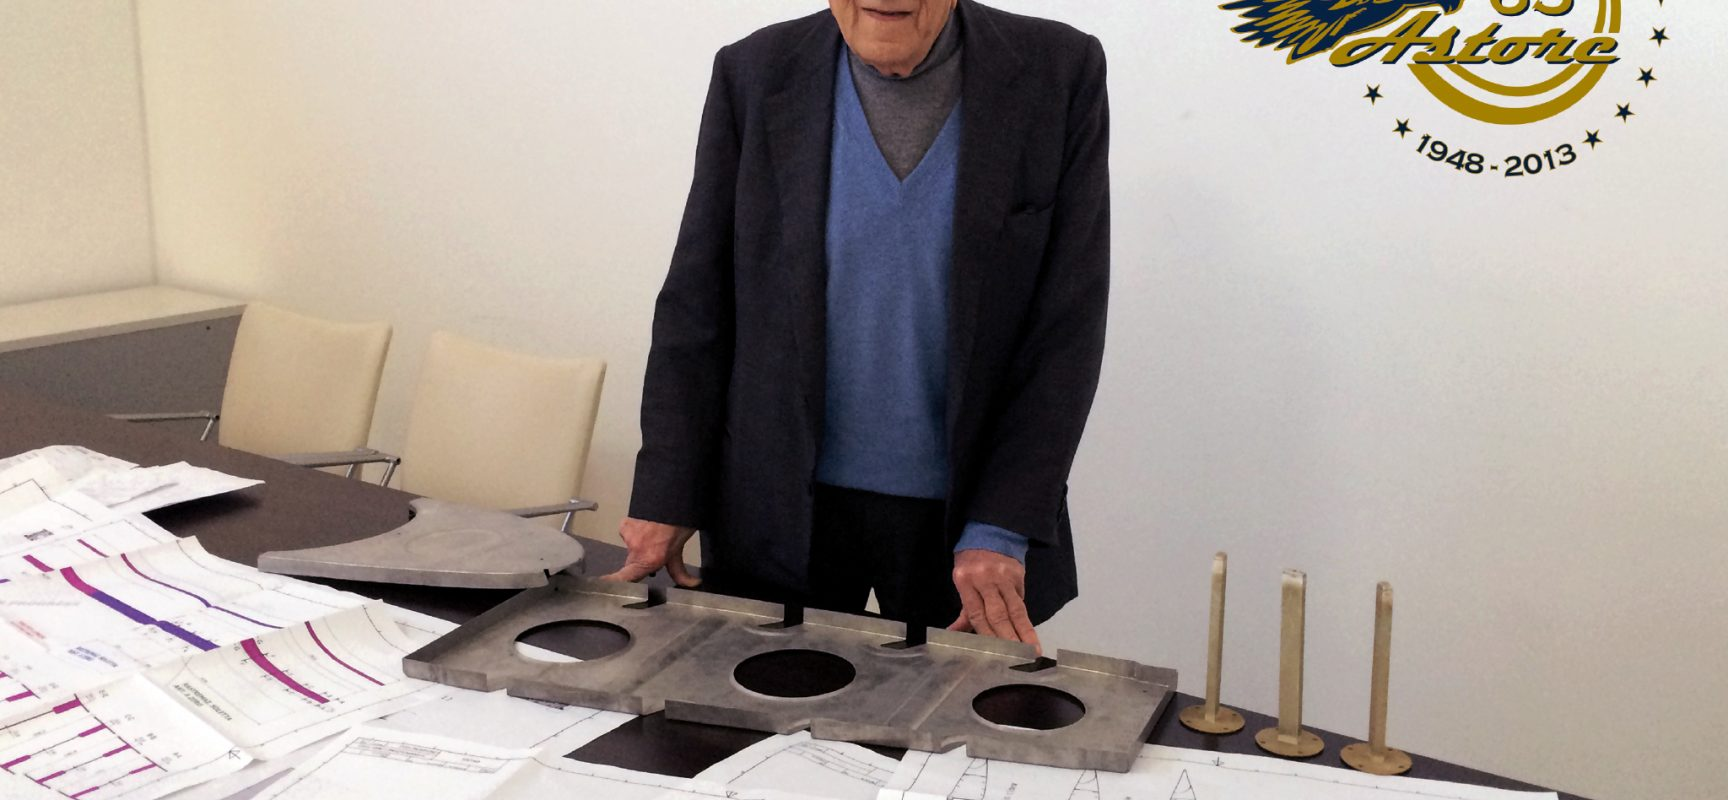 Luigi Pascale, addio fondatore seconda azienda mondiale aerei leggeri